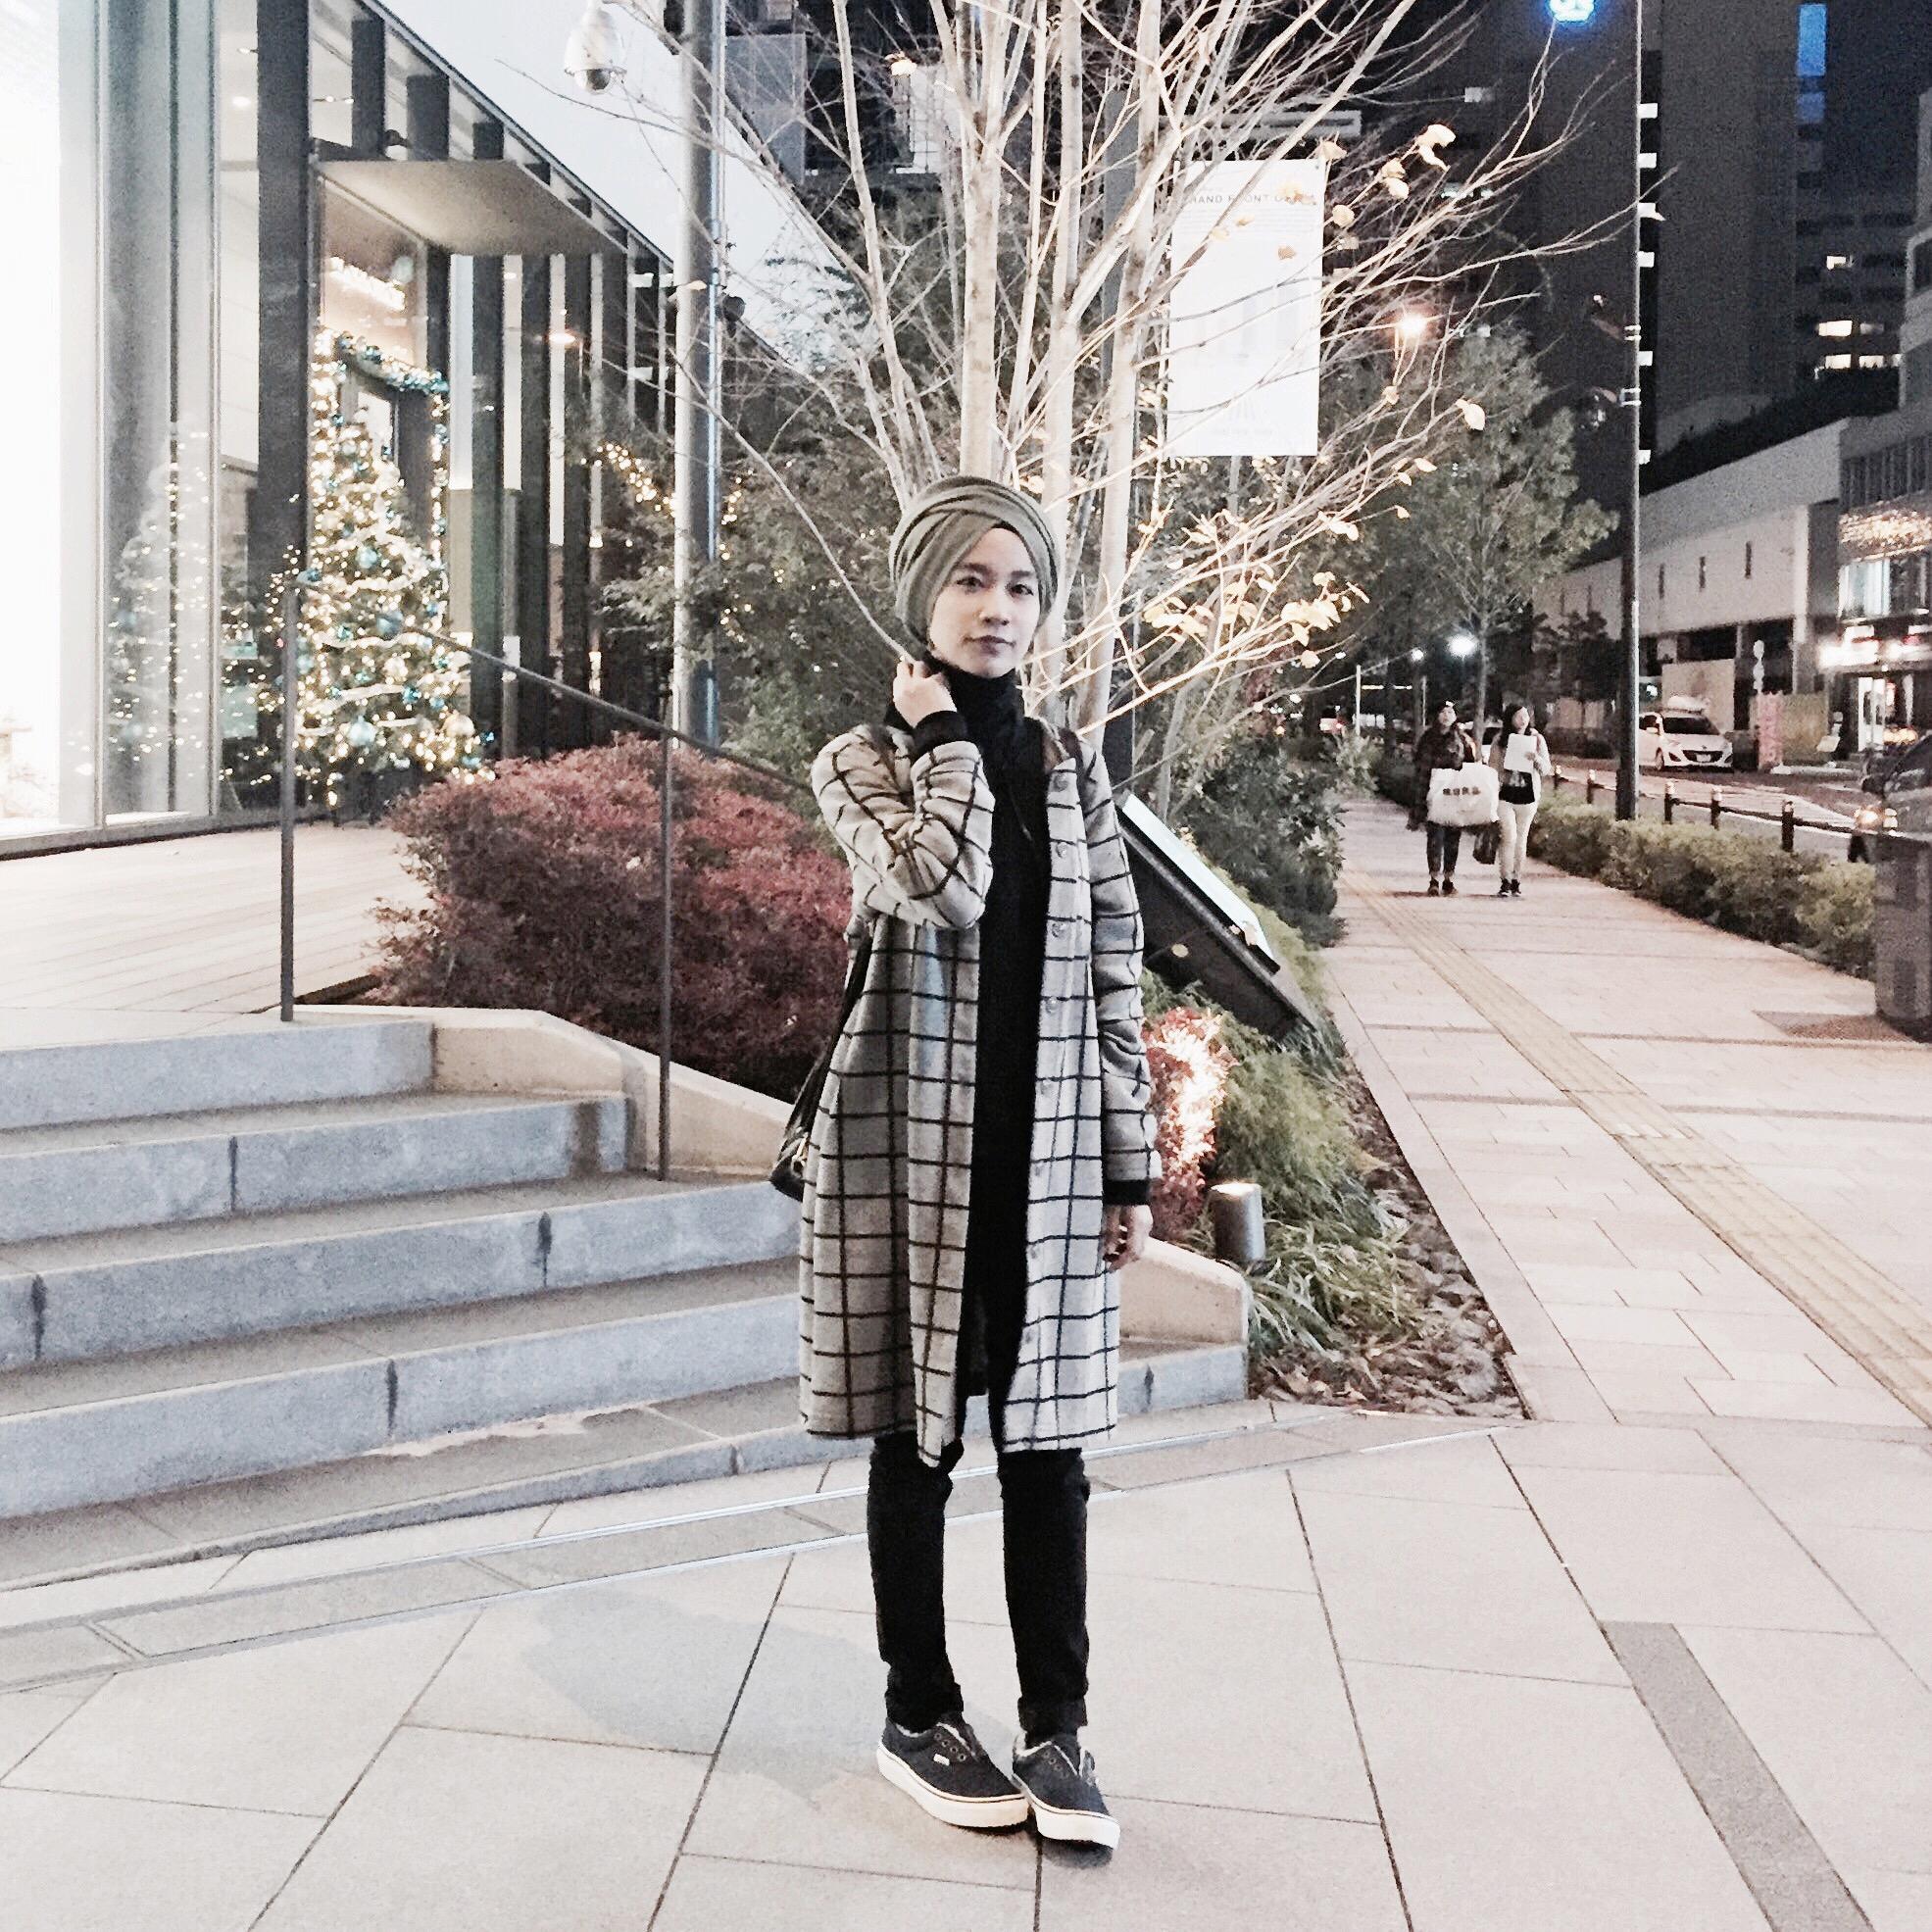 Japan, Dec 2015